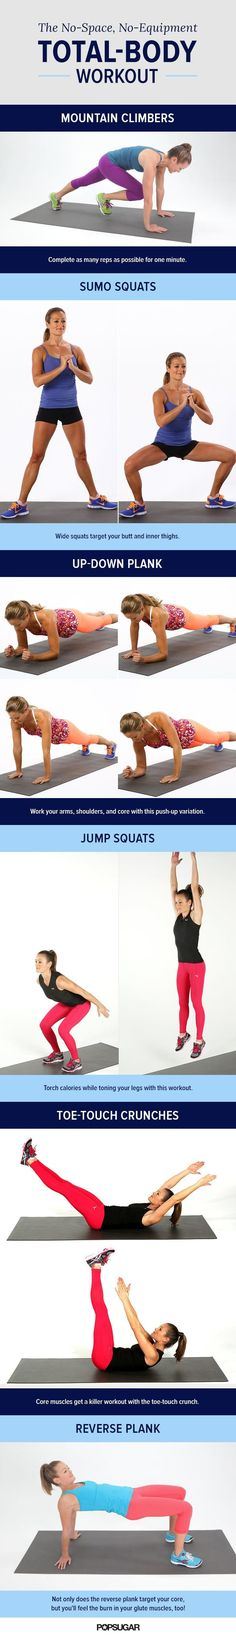 No space? No equipment? No problem! A 20-minute at-home workout from @POPSUGARFitness http://www.popsugar.com/fitness/Total-Body--Equipment-Workout-25524785?utm_campaign=share&utm_medium=d&utm_source=fitsugar via @POPSUGARFitness